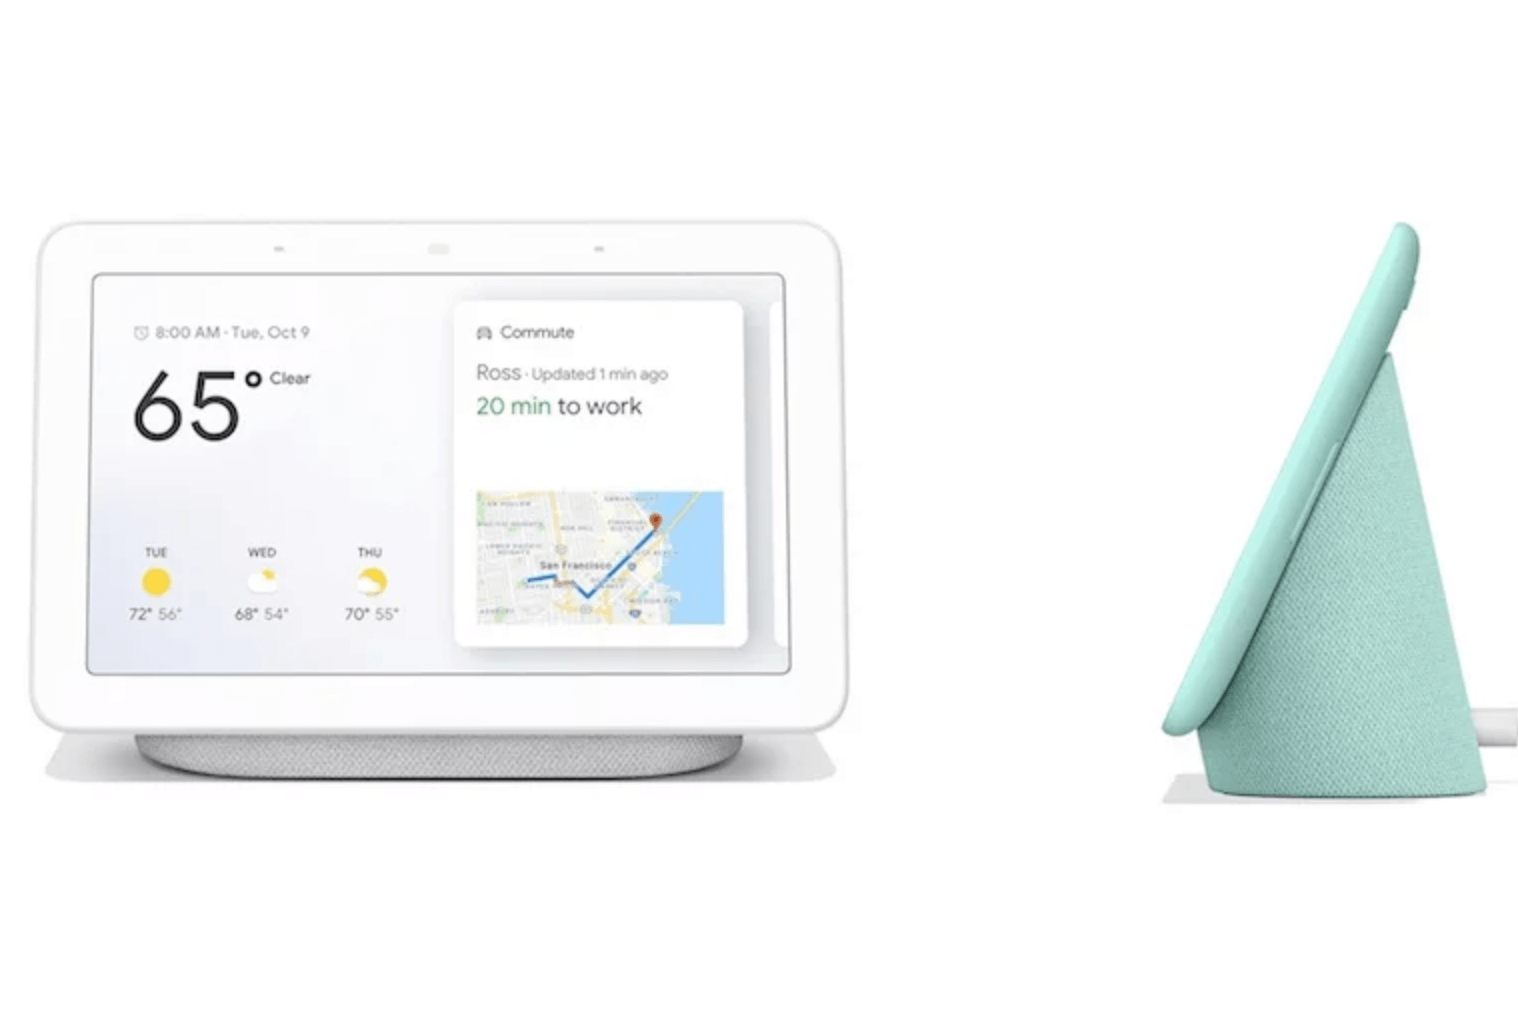 Google Home hub max